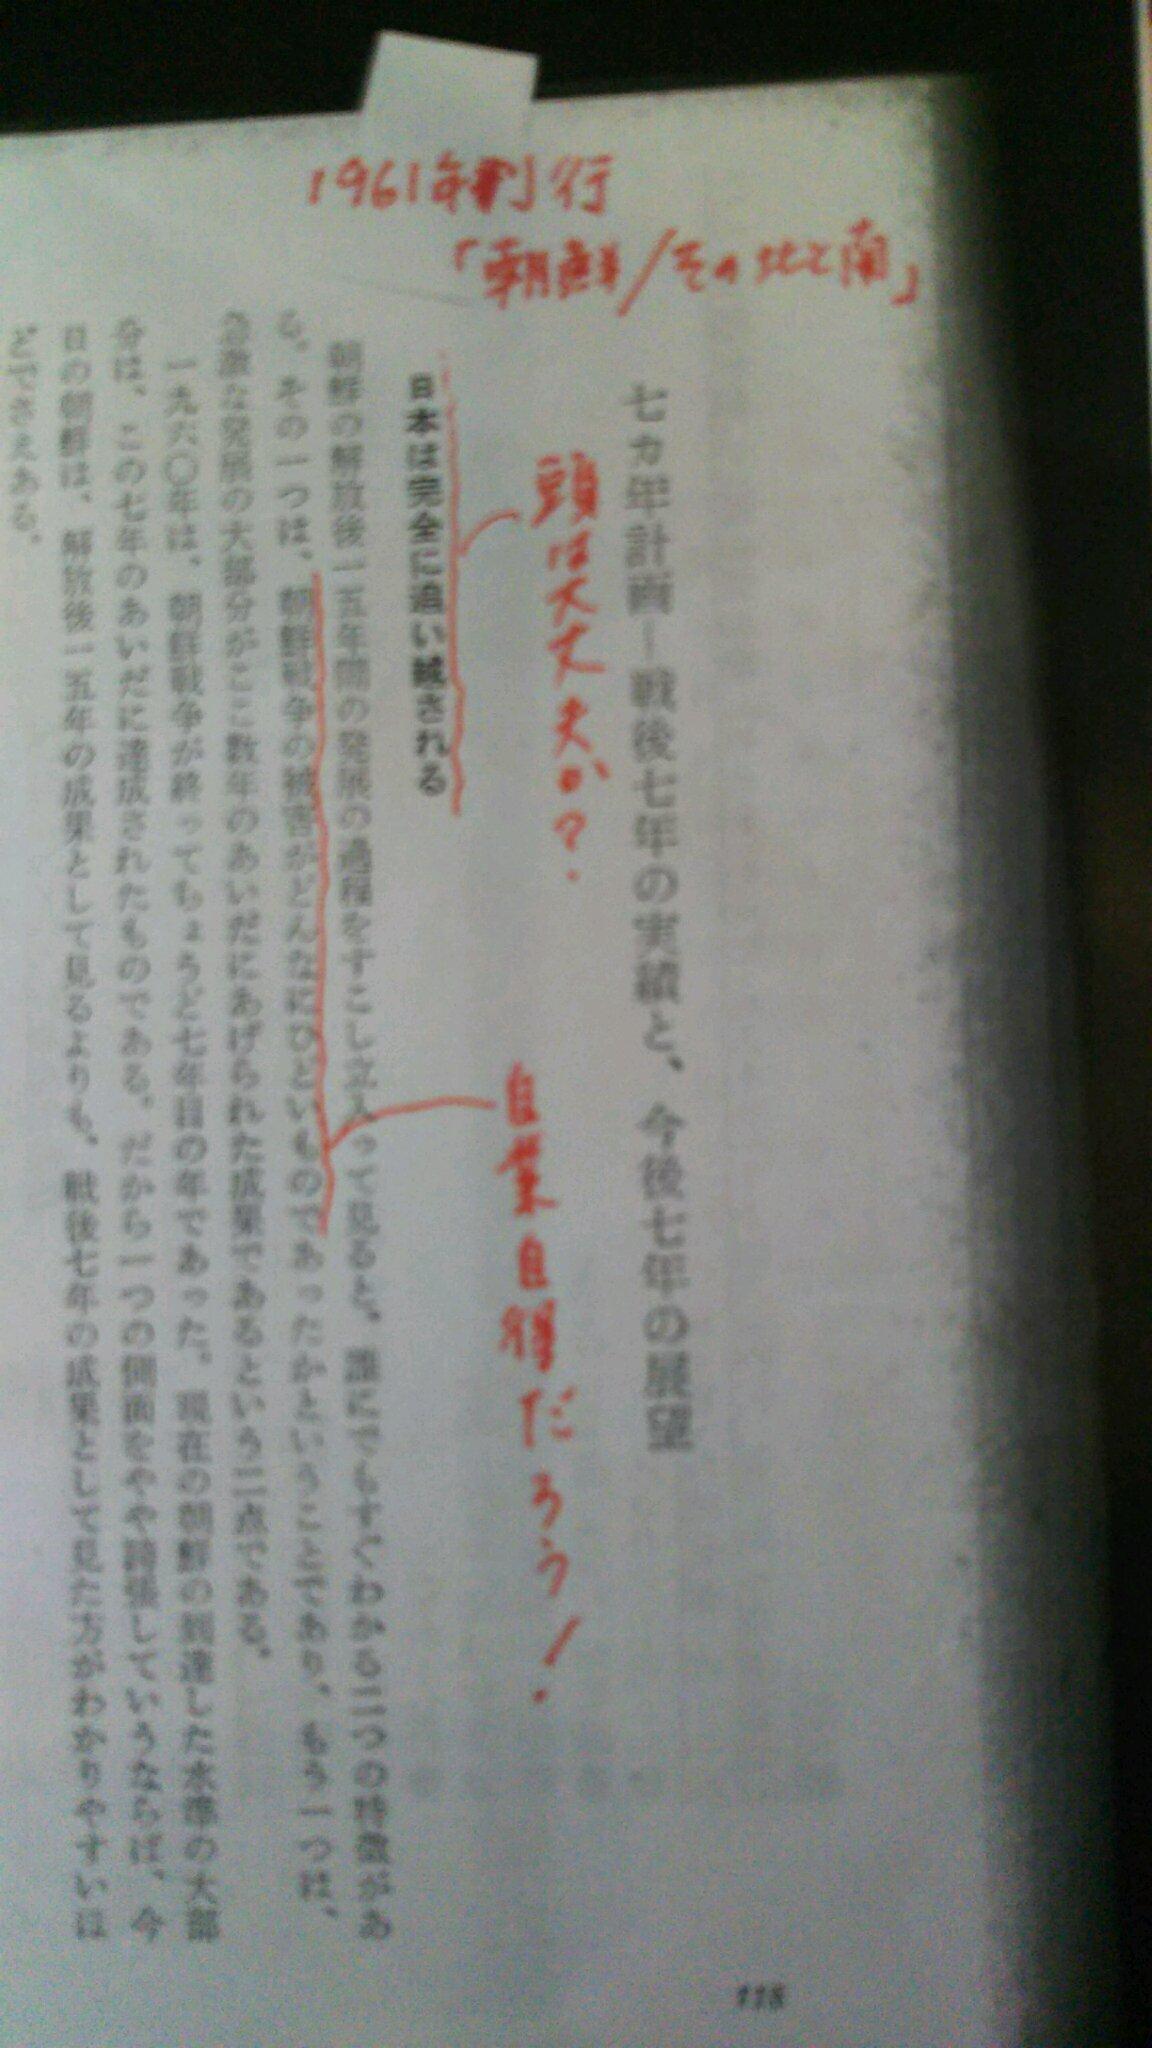 DSC_0231 寺尾五郎の本を校正したら。